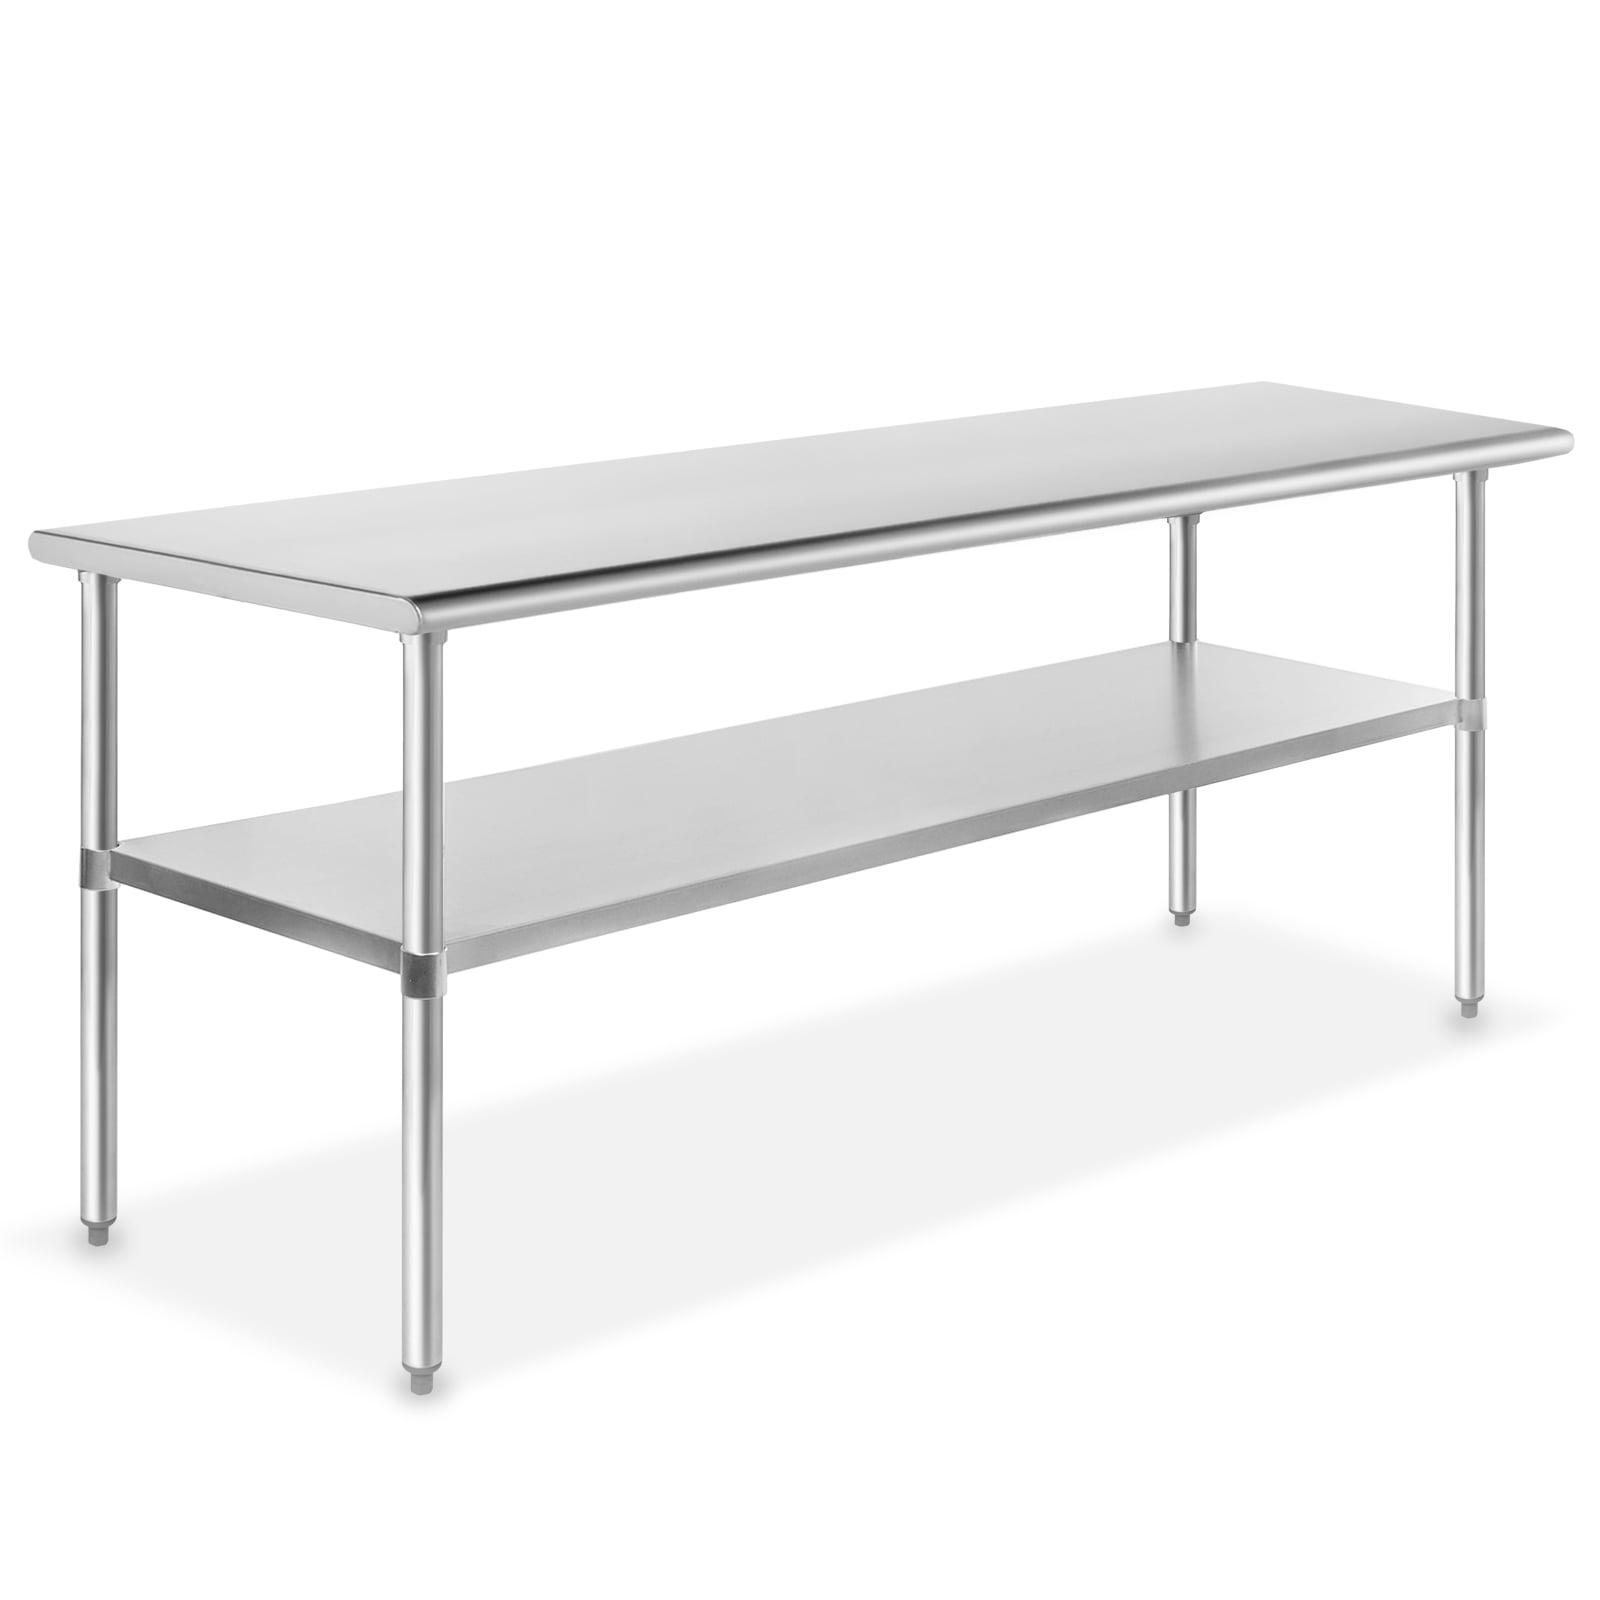 Amgood 18 X 36 Stainless Steel Wall Shelf Utility Room Nsf